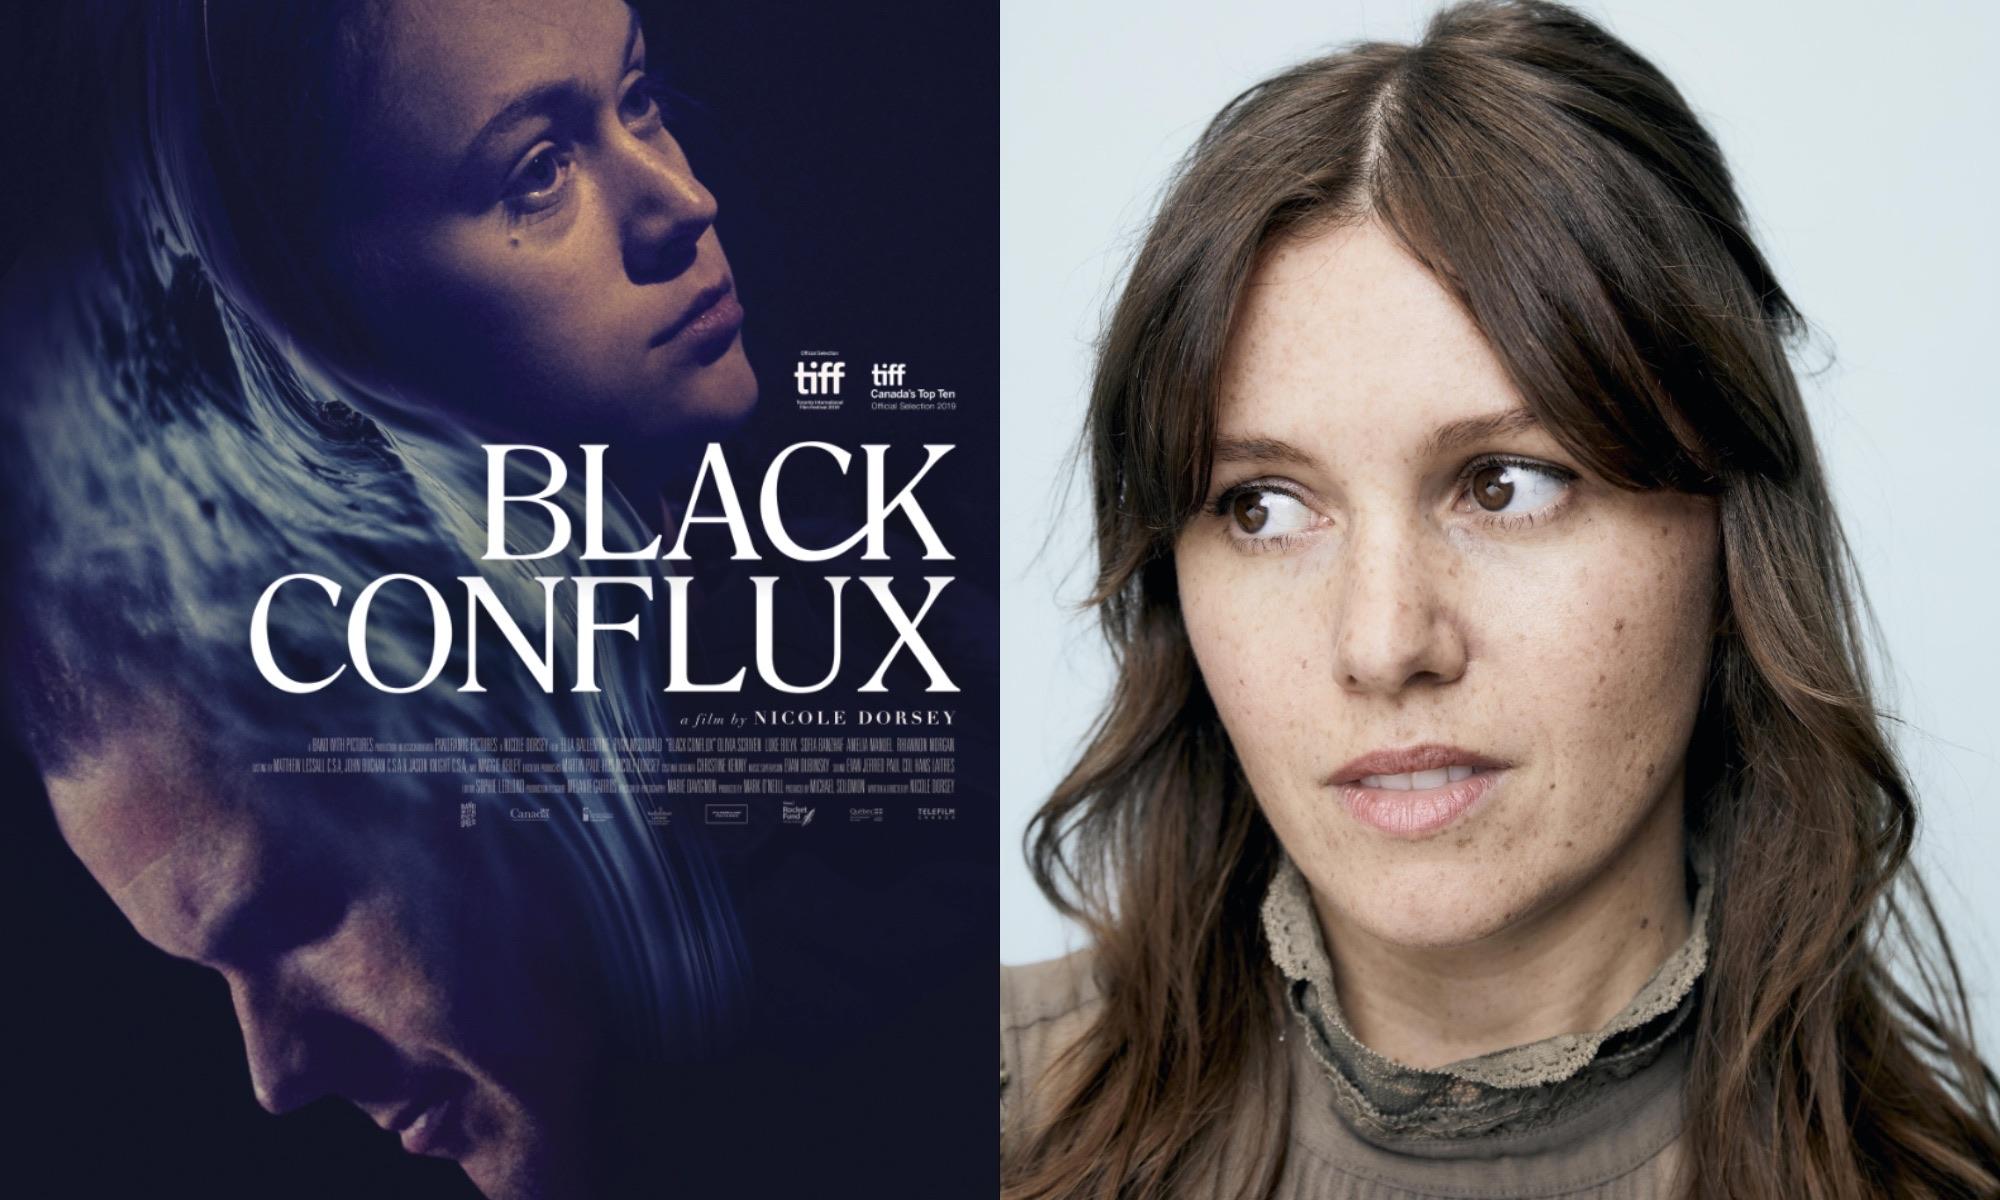 NICOLE DORSEY, BLACK CONFLUX, TIFF X, SAMSUNG STUDIO